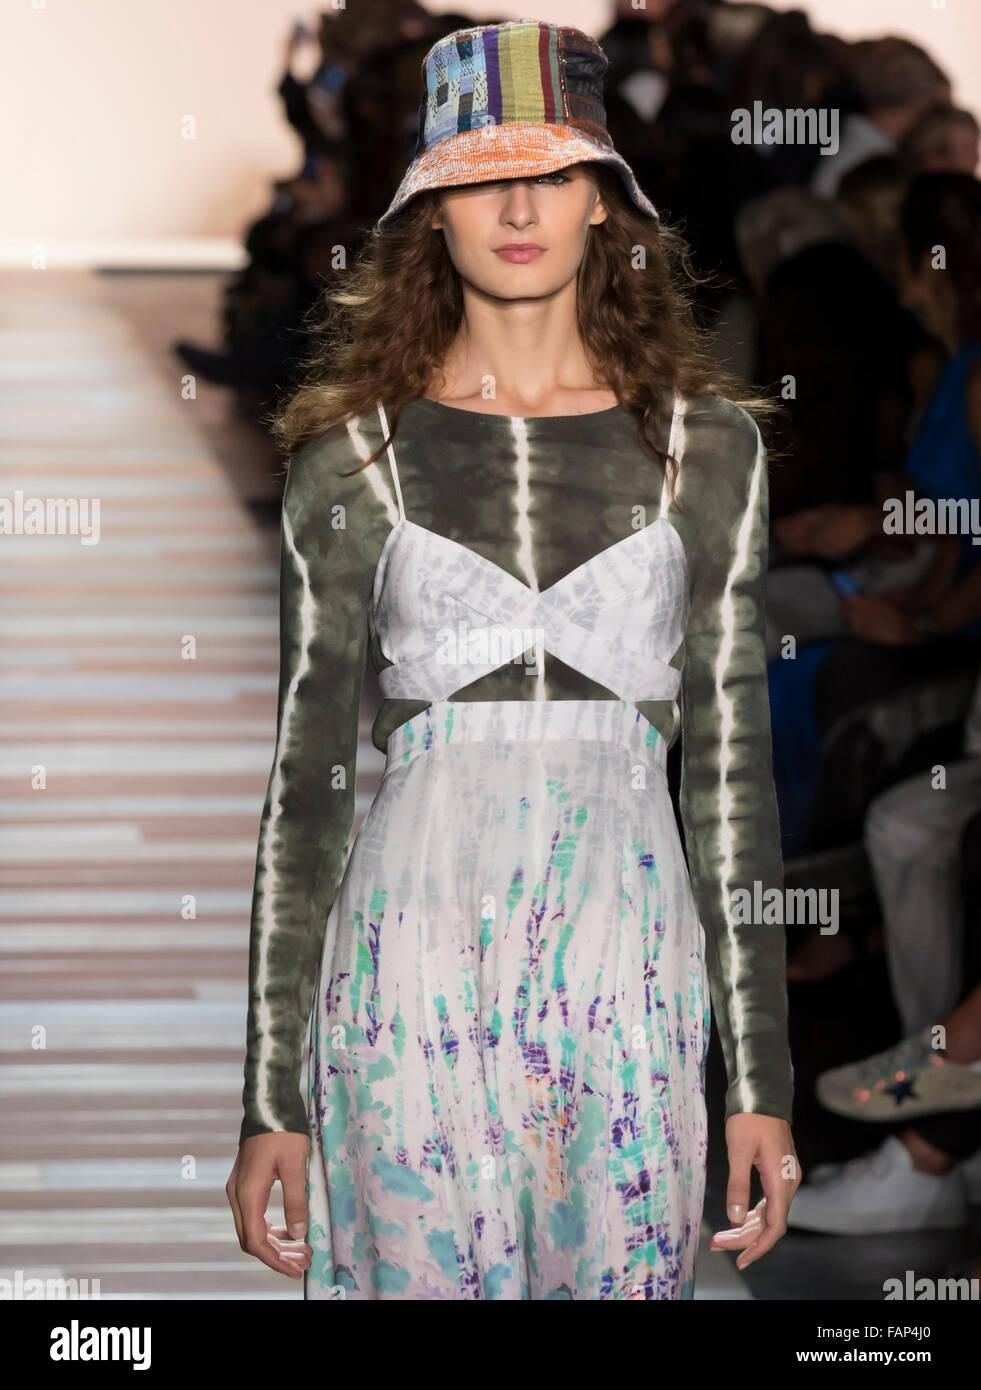 New York, NY - September 10, 2015: Daniela Aciu walks the runway at the BCBG Max Azria fashion show during the Spring - Stock Image